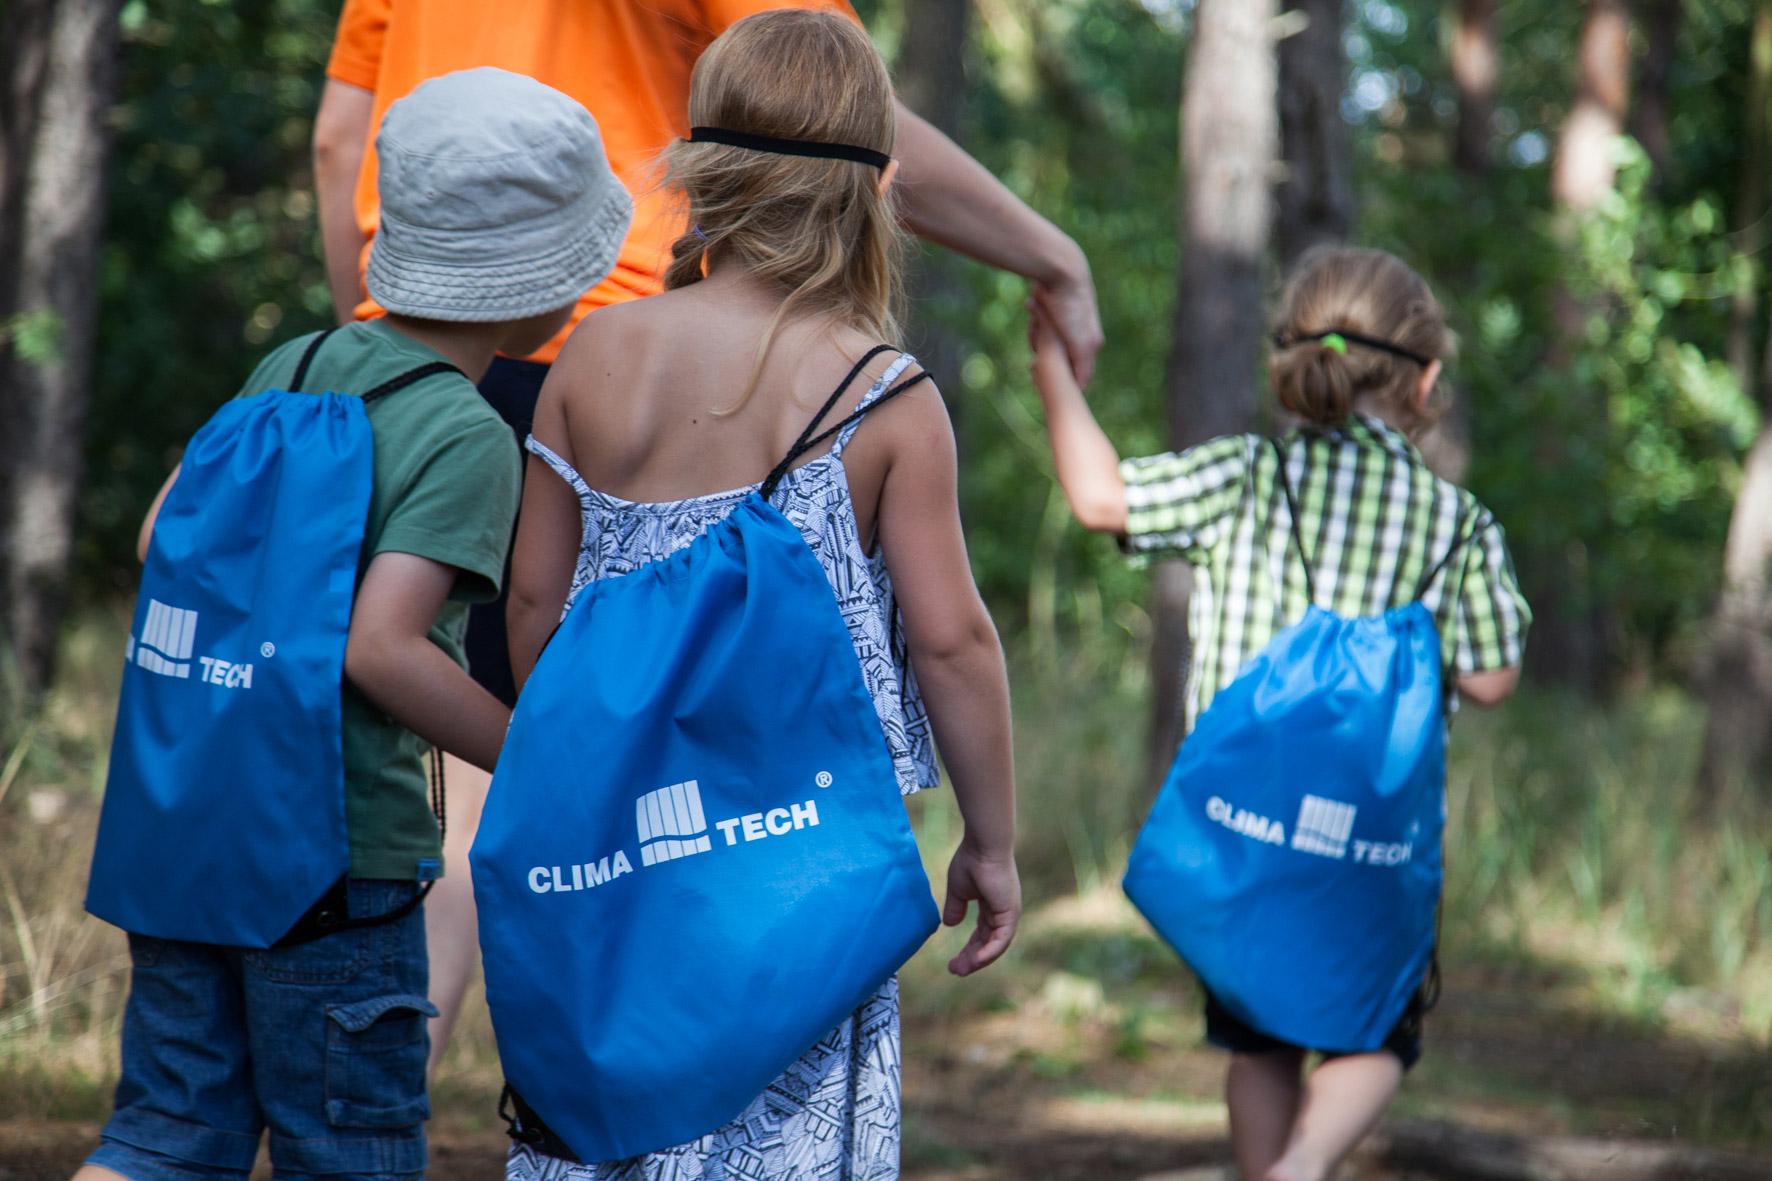 climatech-2016-rubiconpark-3705